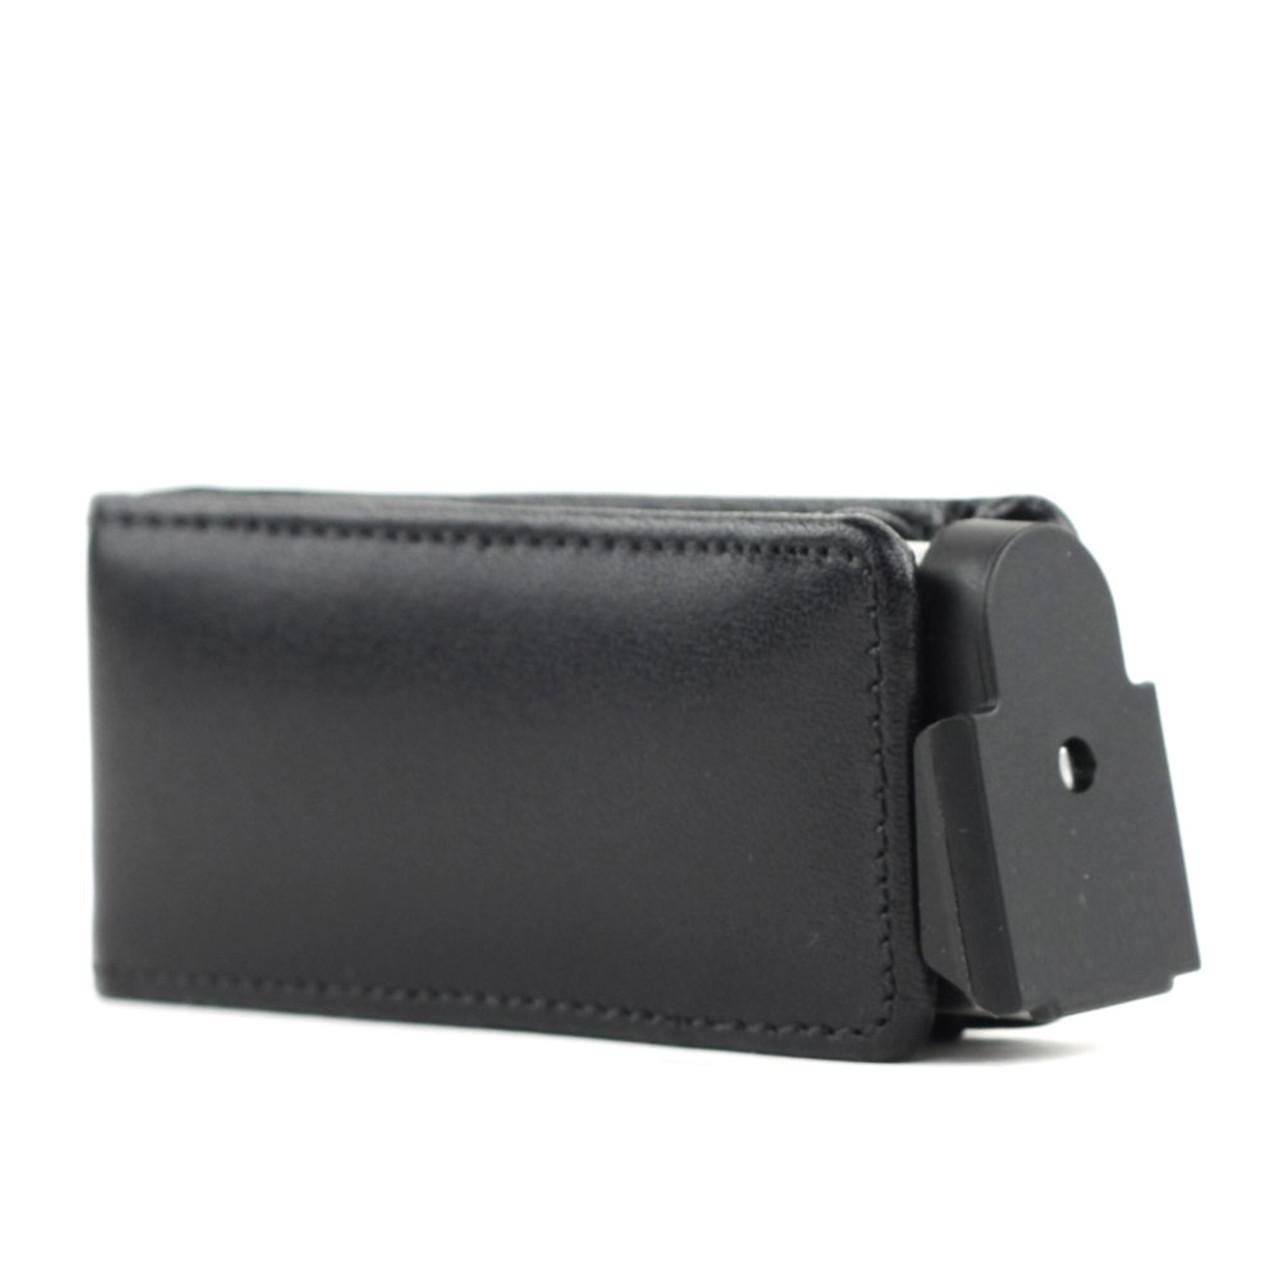 Sig P250 Sub Compact 9mm Magazine Pocket Protector